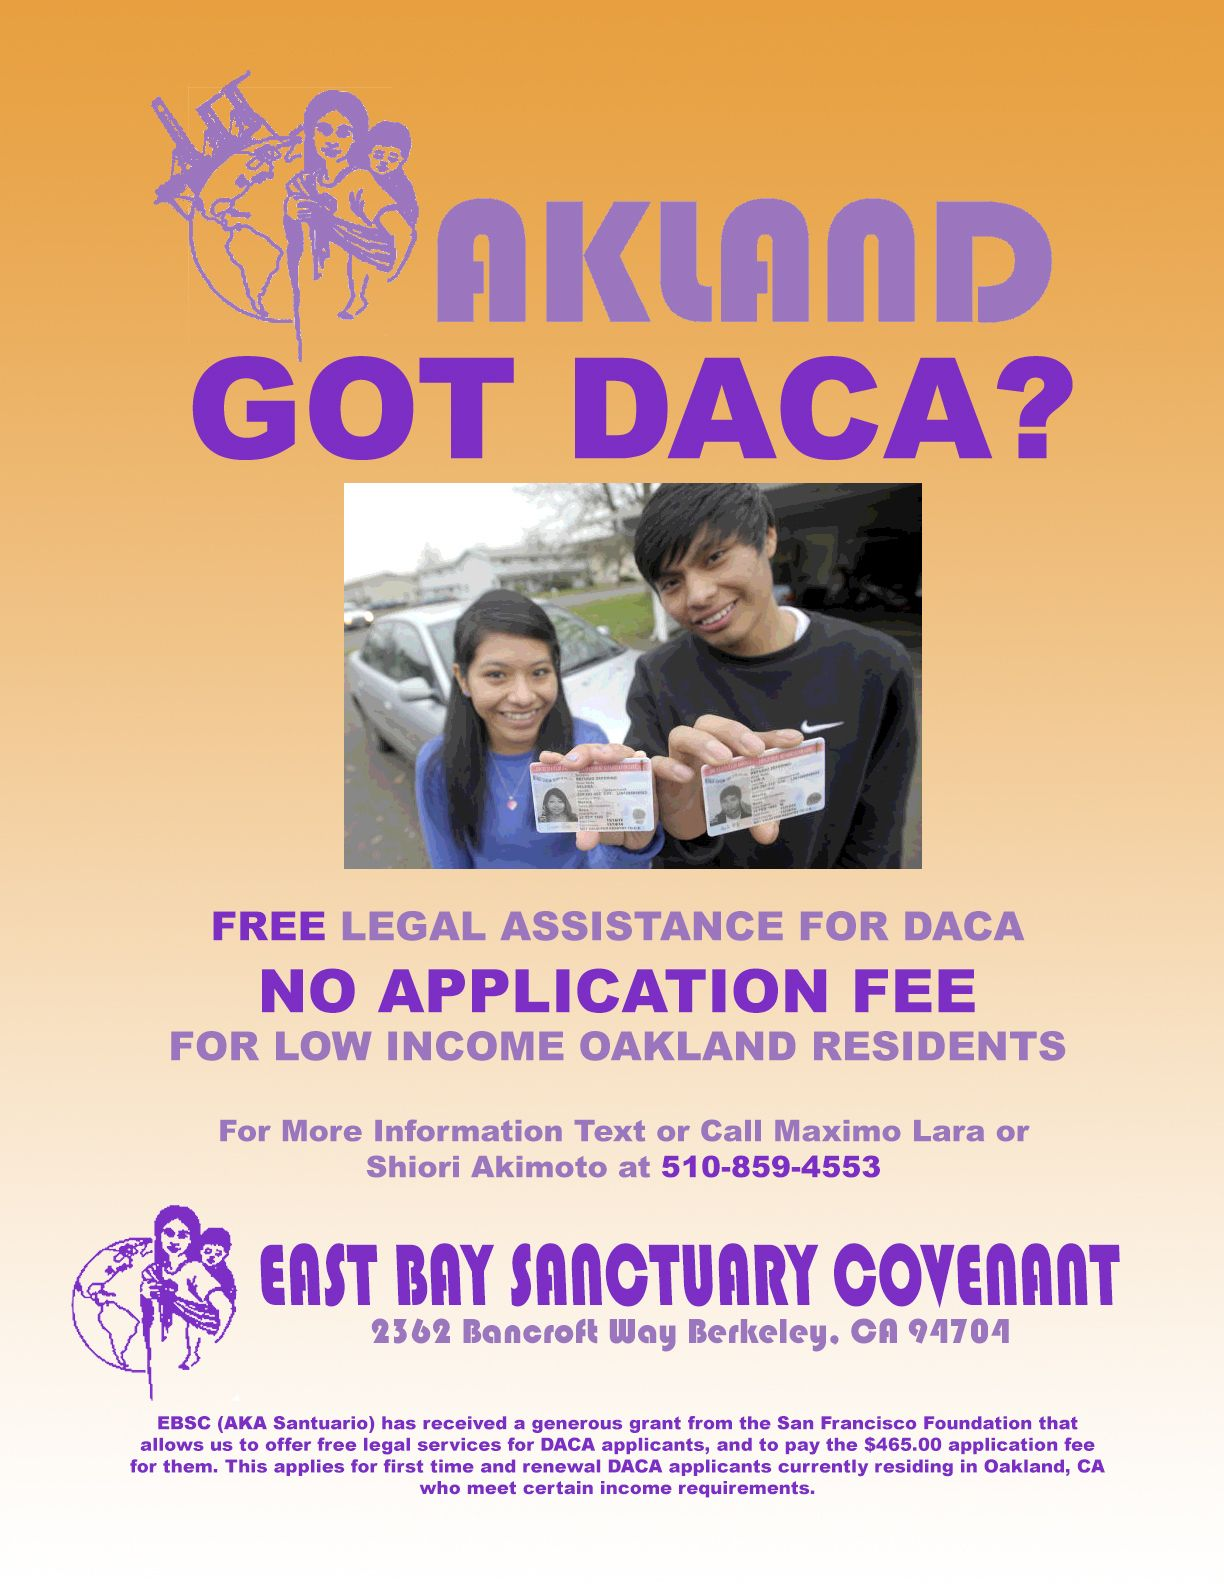 A Board of Immigration Appeals Recognized Non-Profit Organization